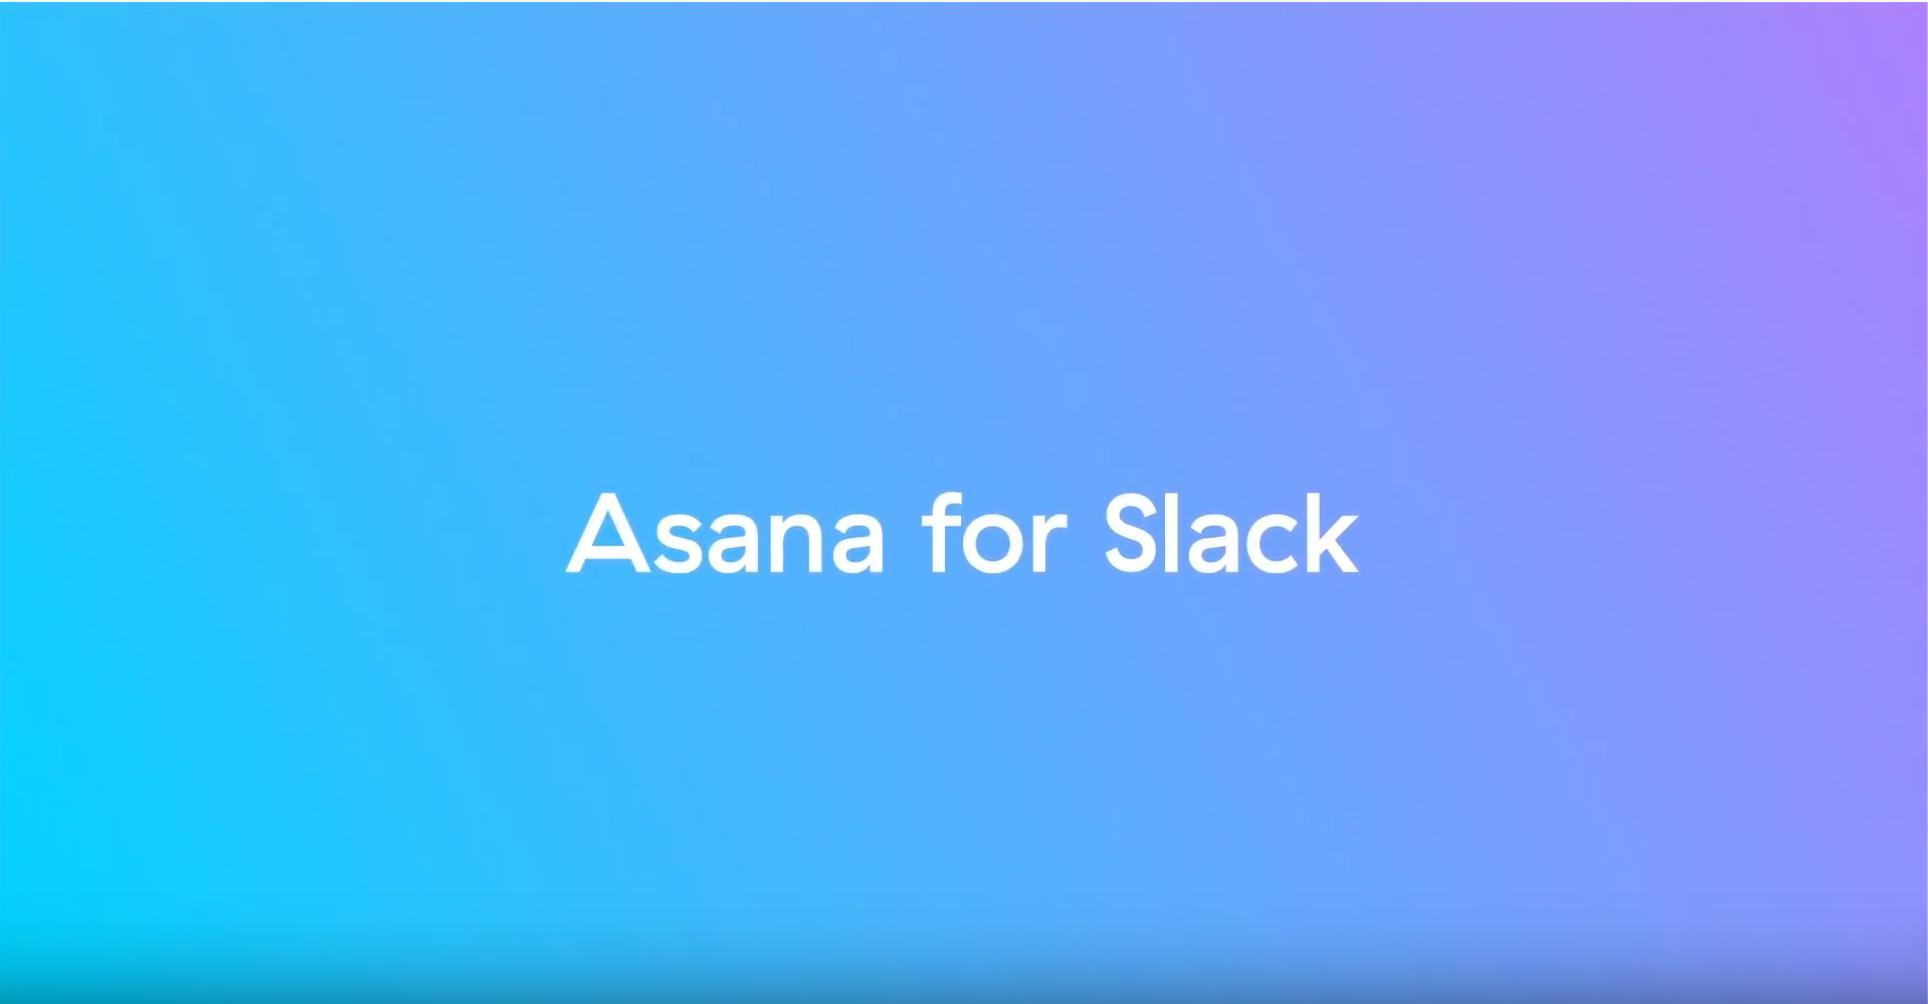 Asana and Slack